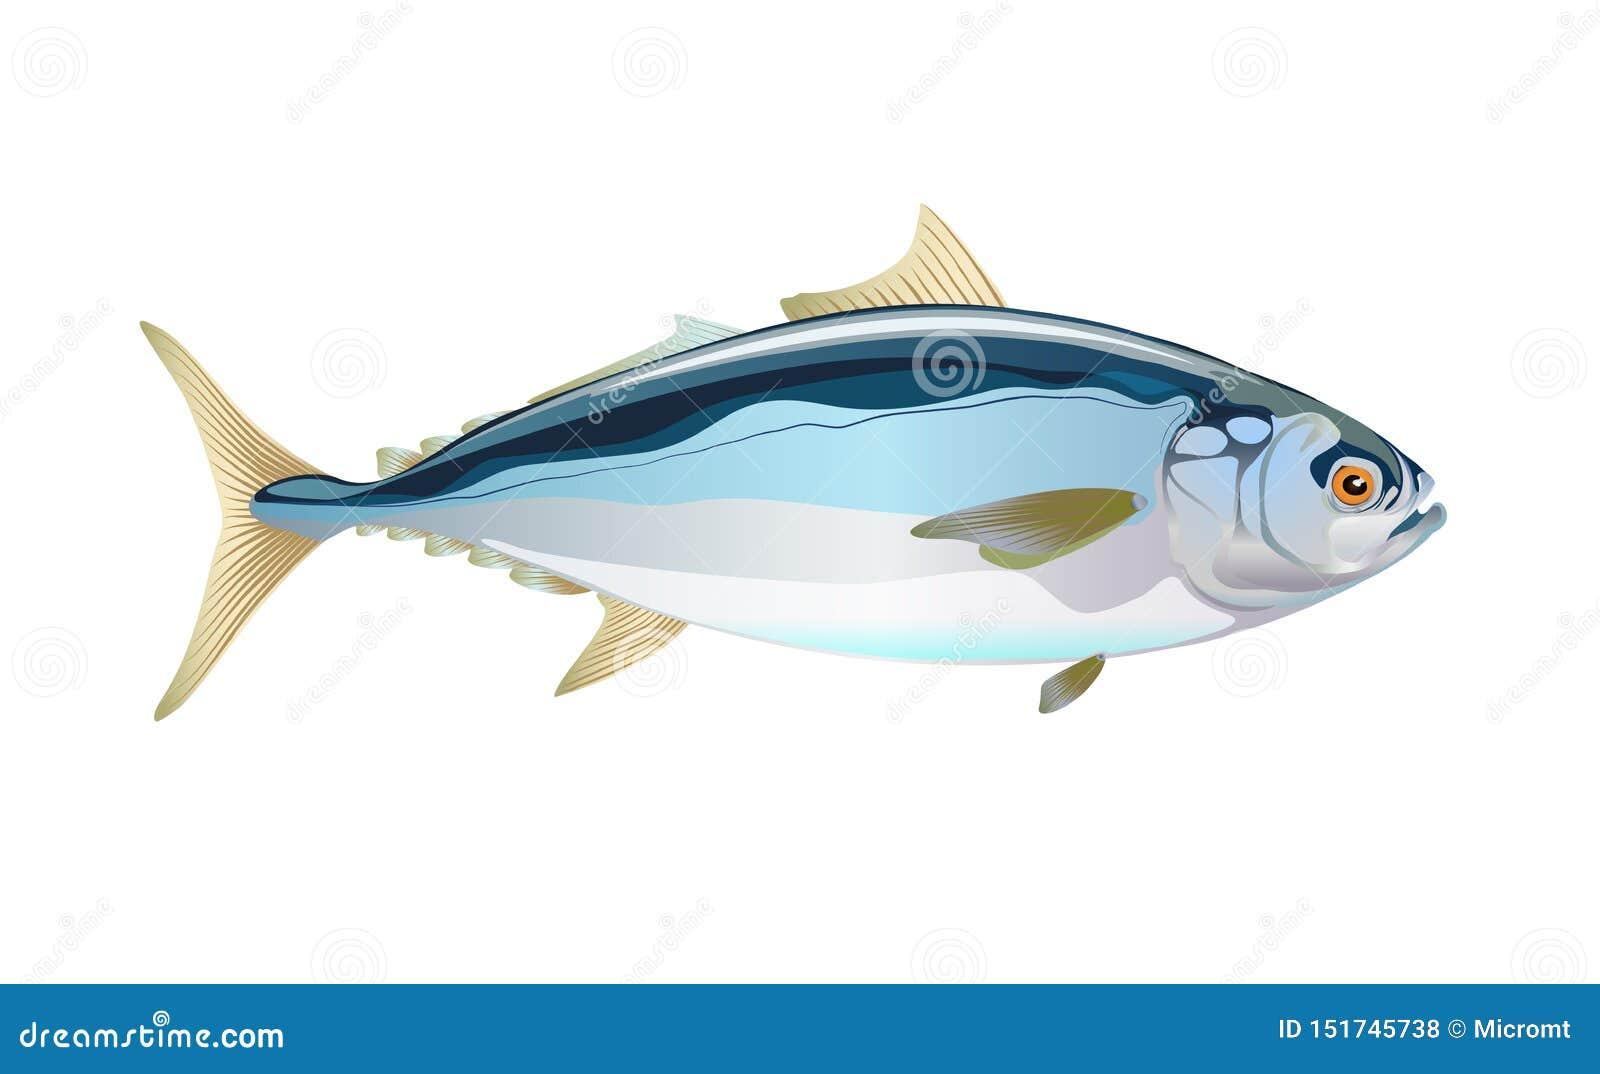 Japanese Yellowtail Fish, Isolated Flat On Light Background